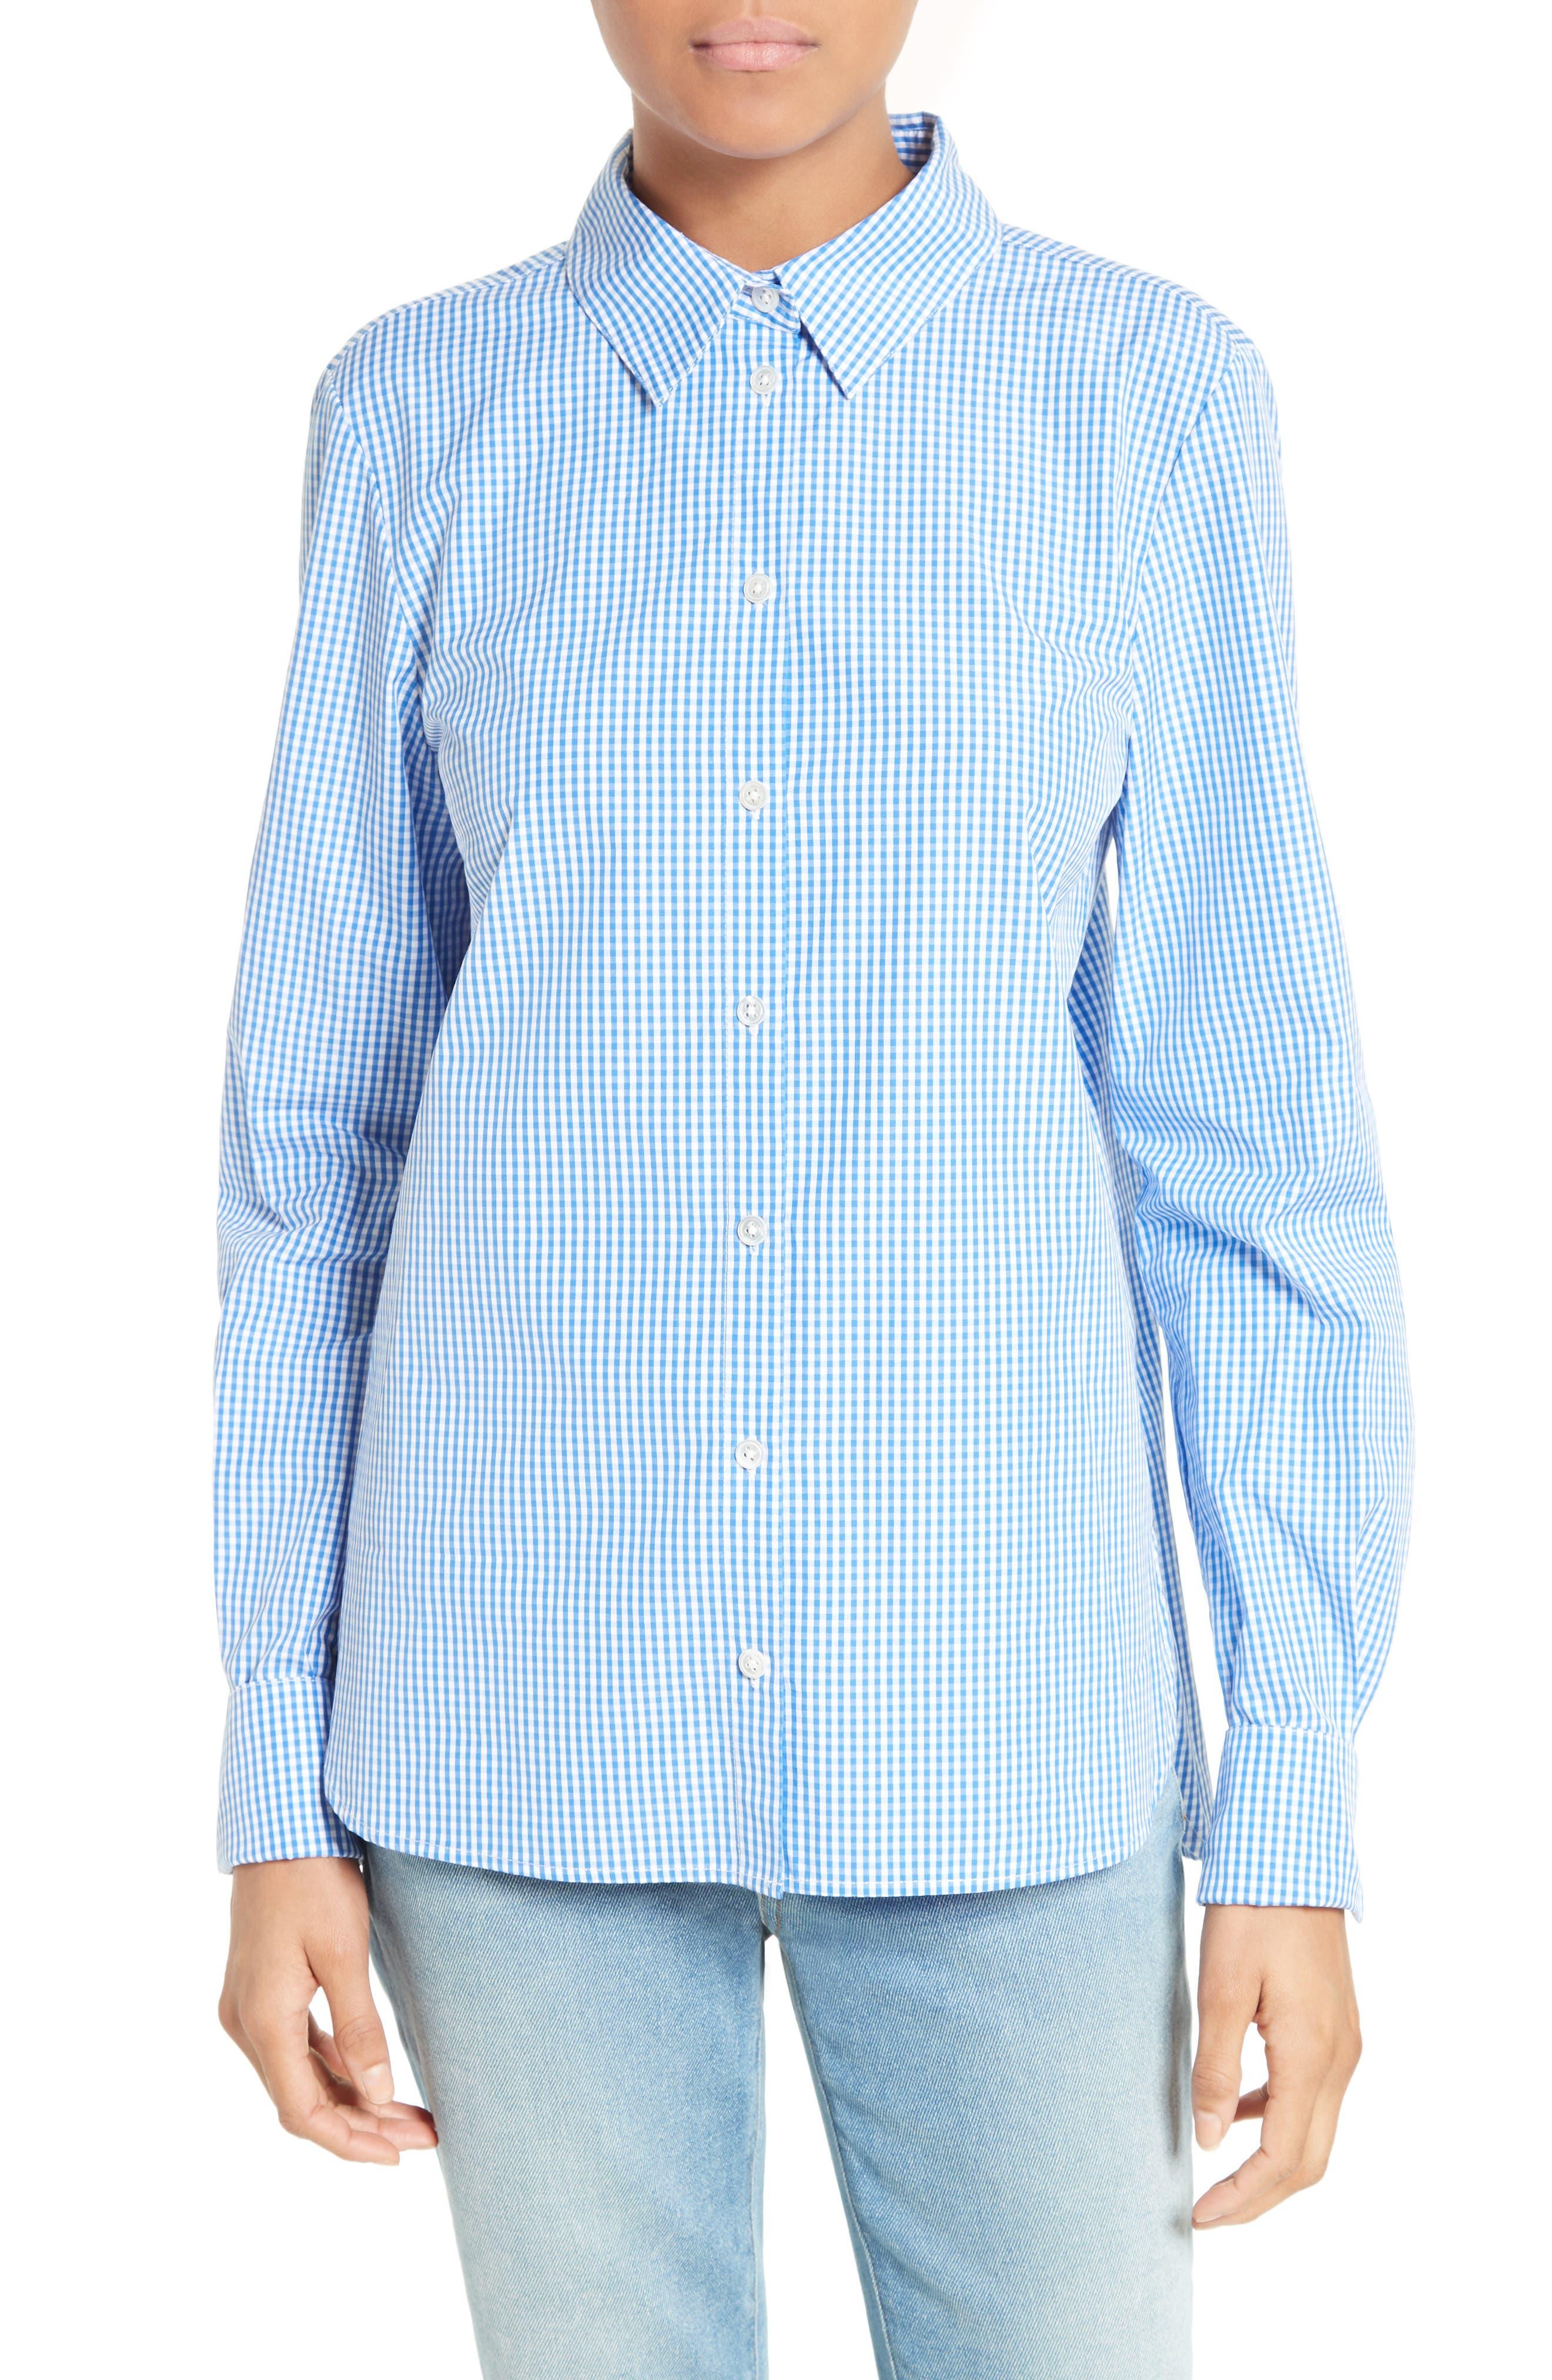 Tibi Gingham Cotton Slim Fit Shirt